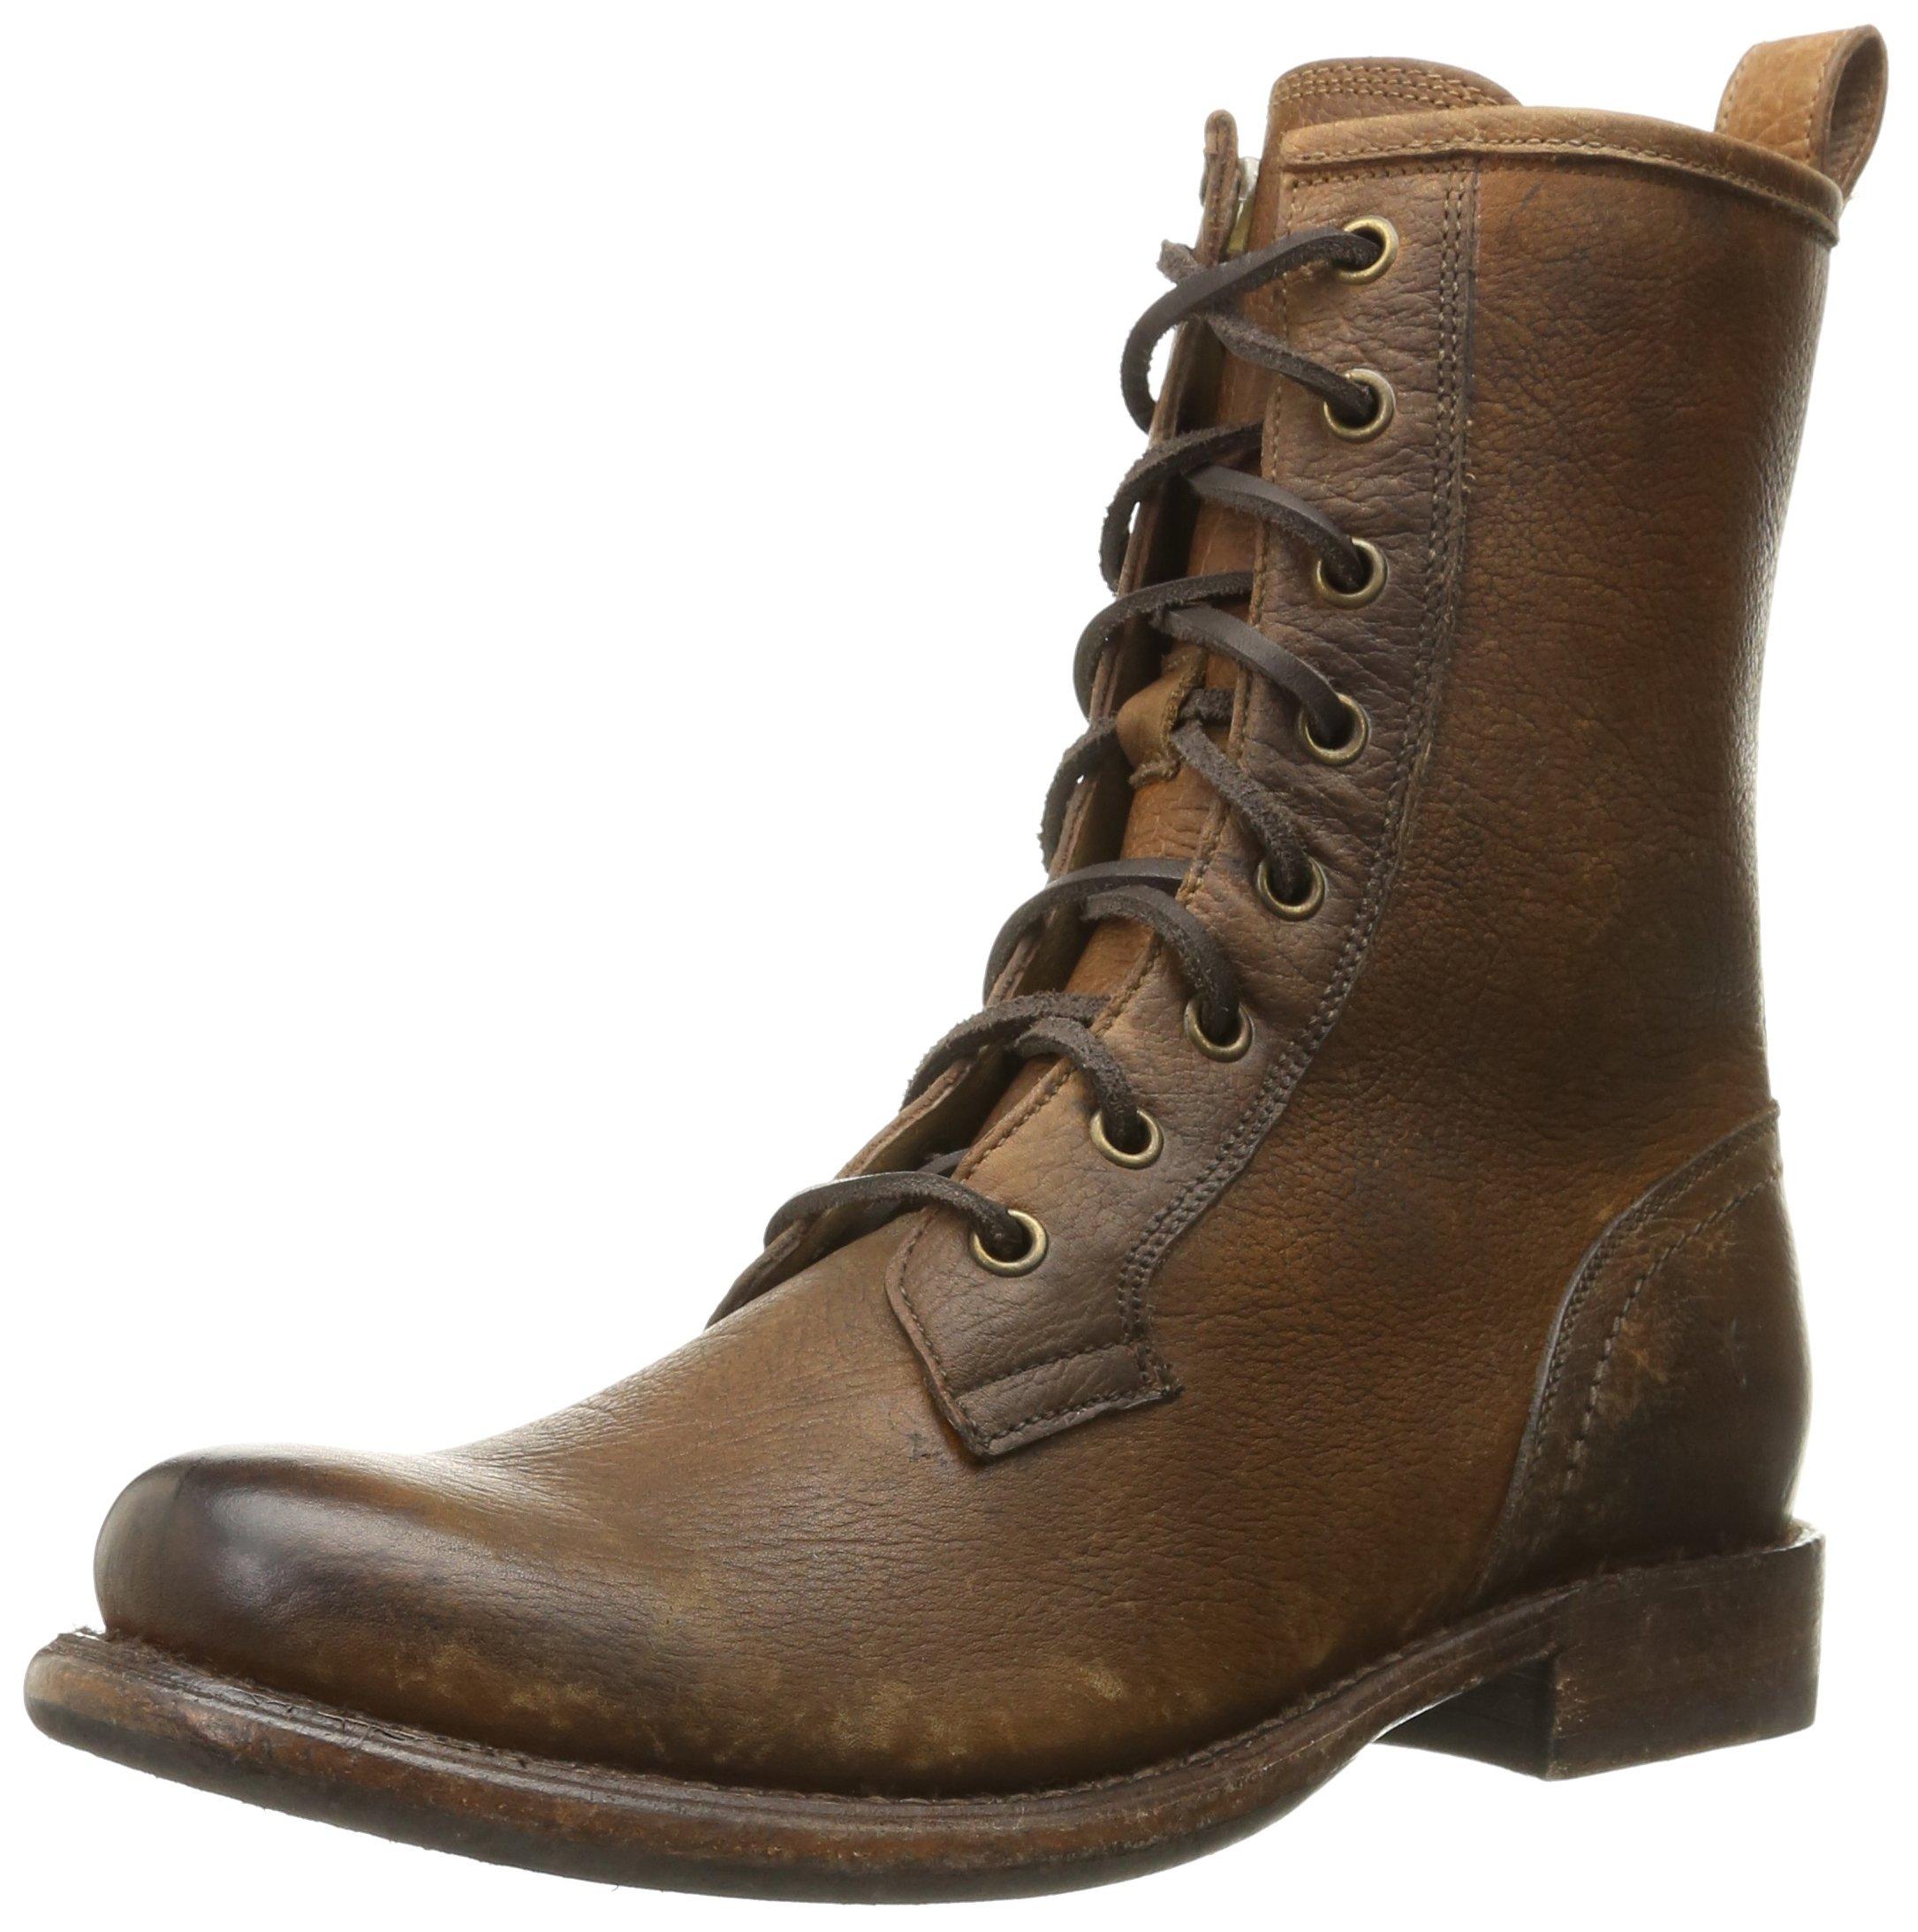 FRYE Women's Jenna Combat Boot, Cognac, 8.5 M US